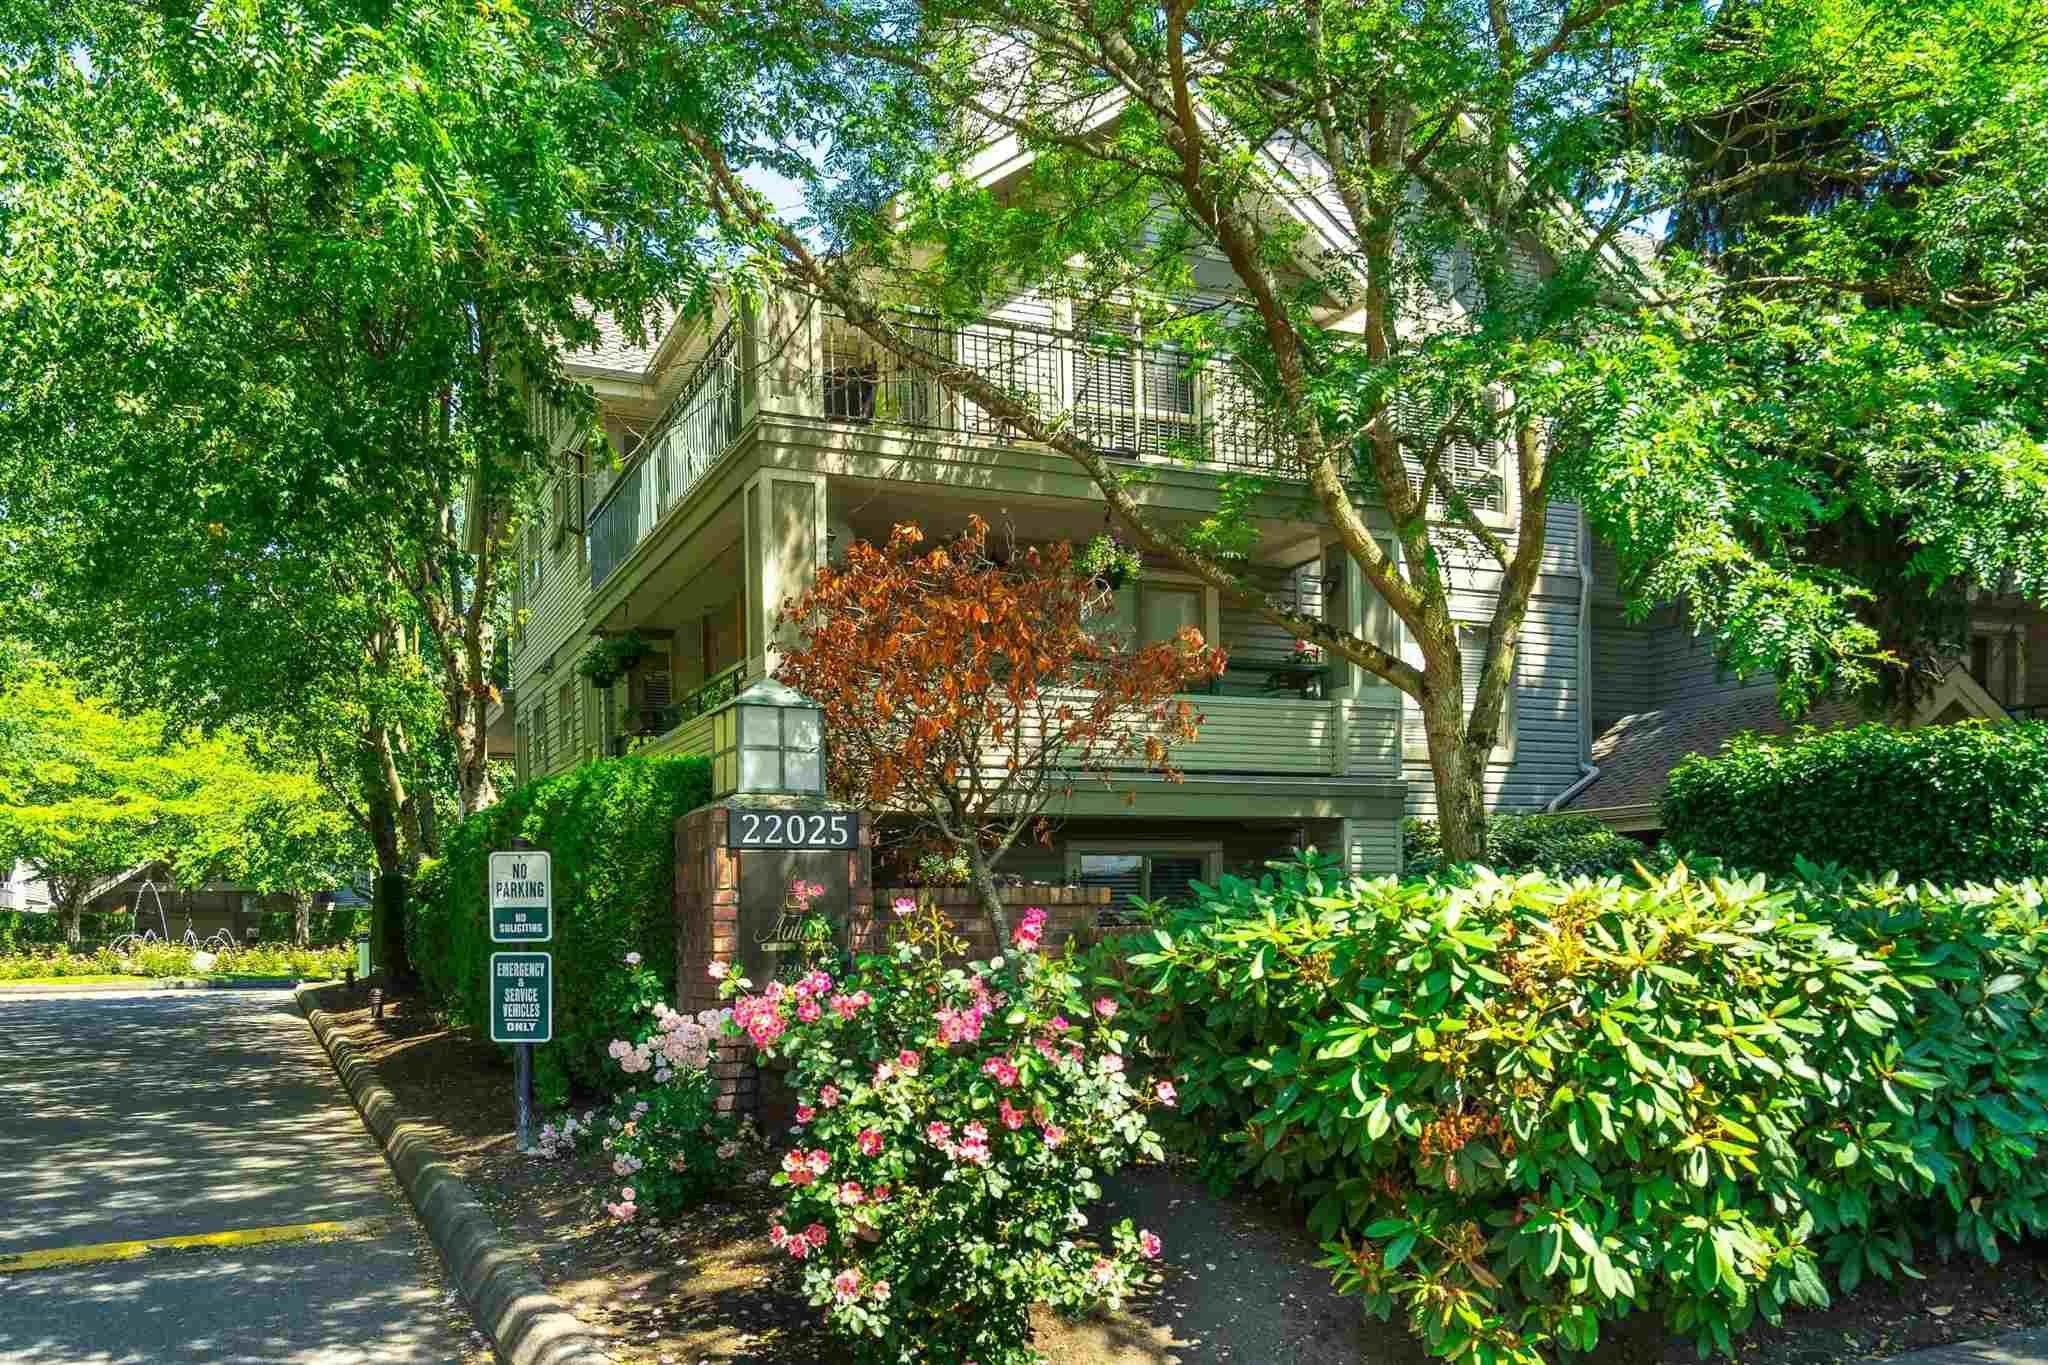 "Main Photo: 101 22025 48 Avenue in Langley: Murrayville Condo for sale in ""Autumn Ridge"" : MLS®# R2597275"